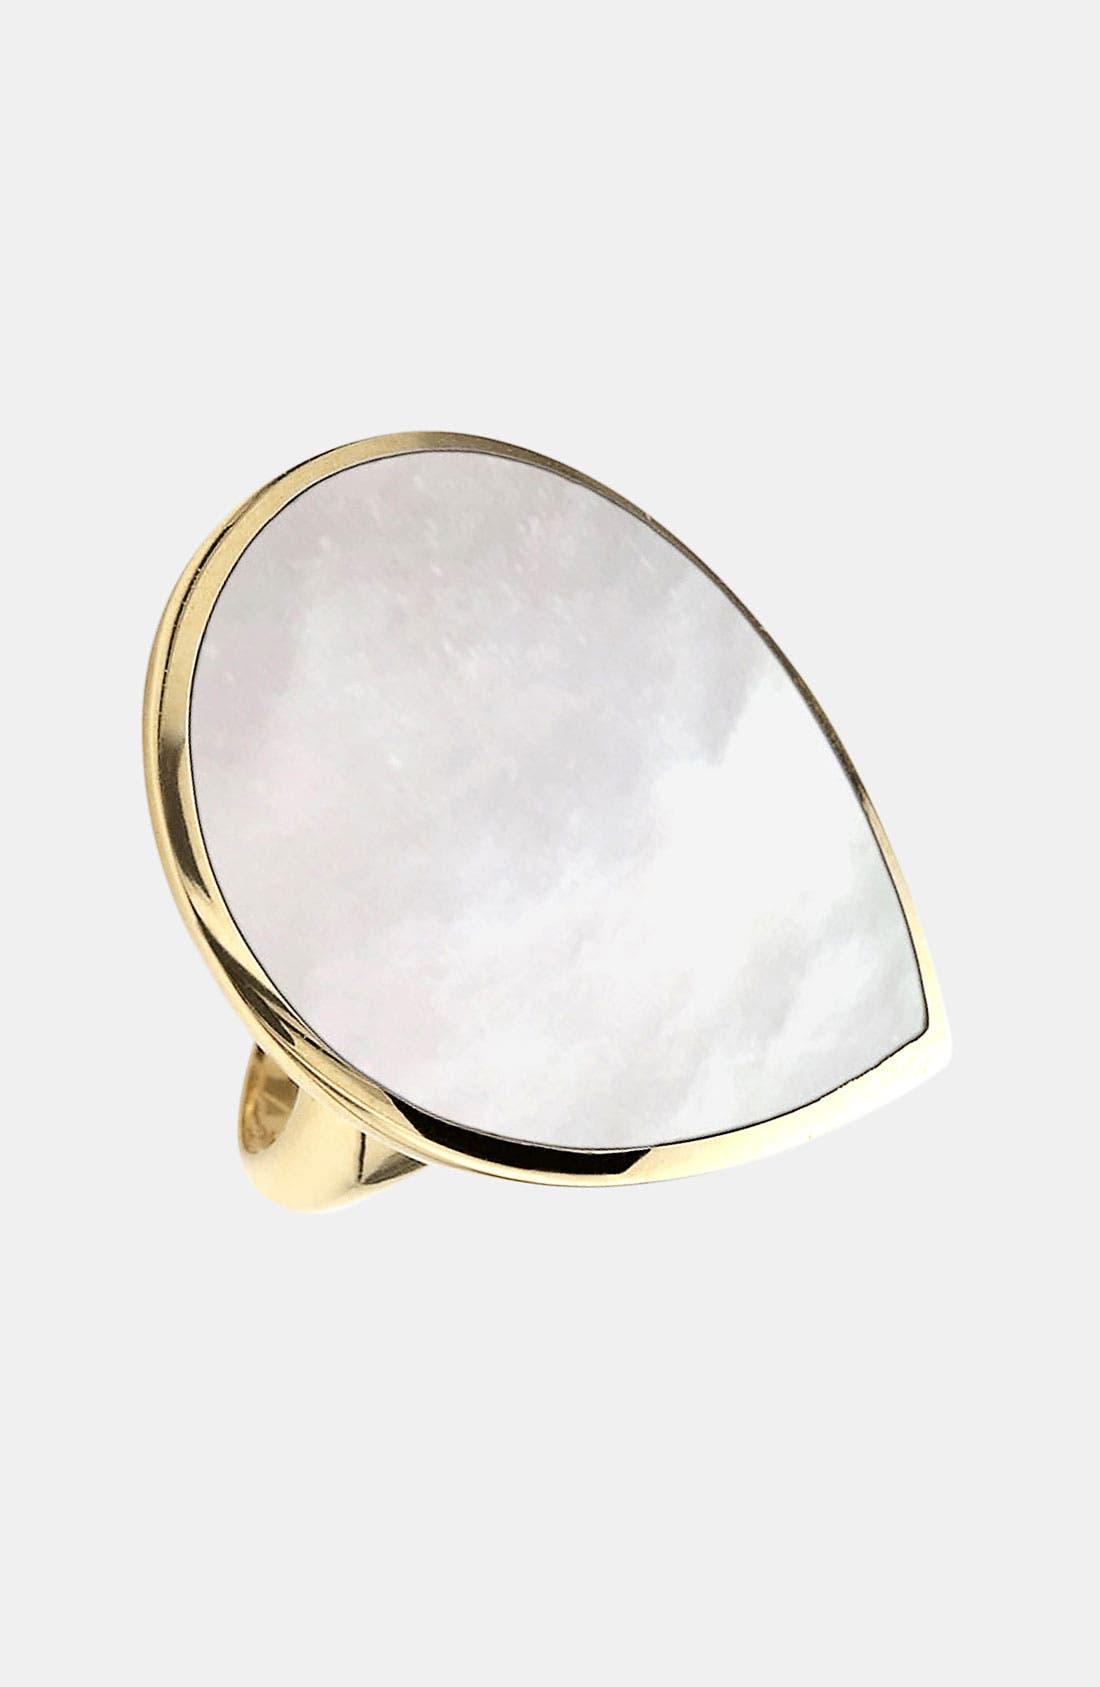 Main Image - Ippolita 'Rock Candy' 18k Gold Large Teardrop Ring